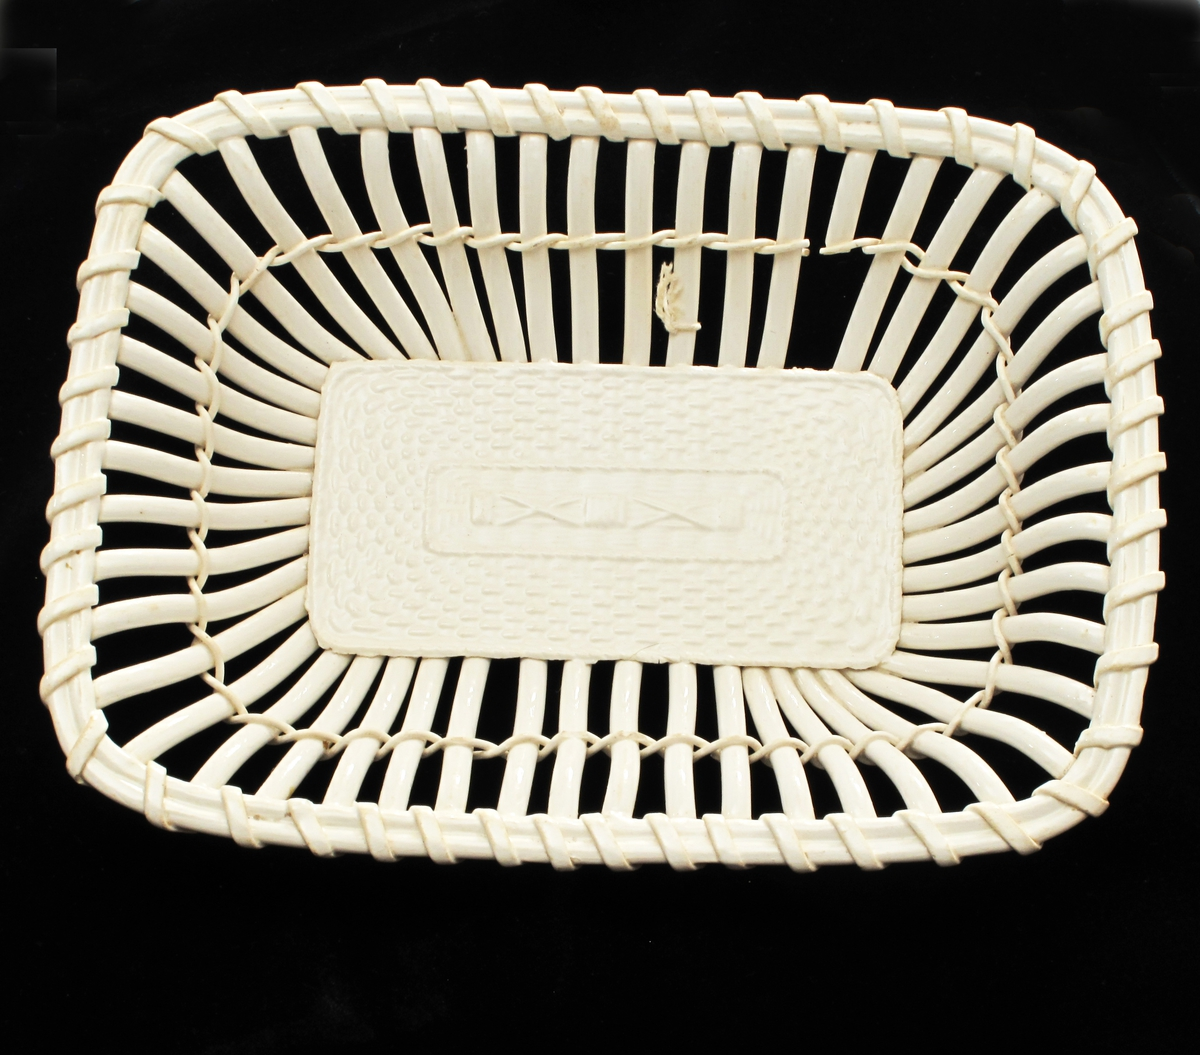 Etterligning av kurvmakerarbeide i creamware